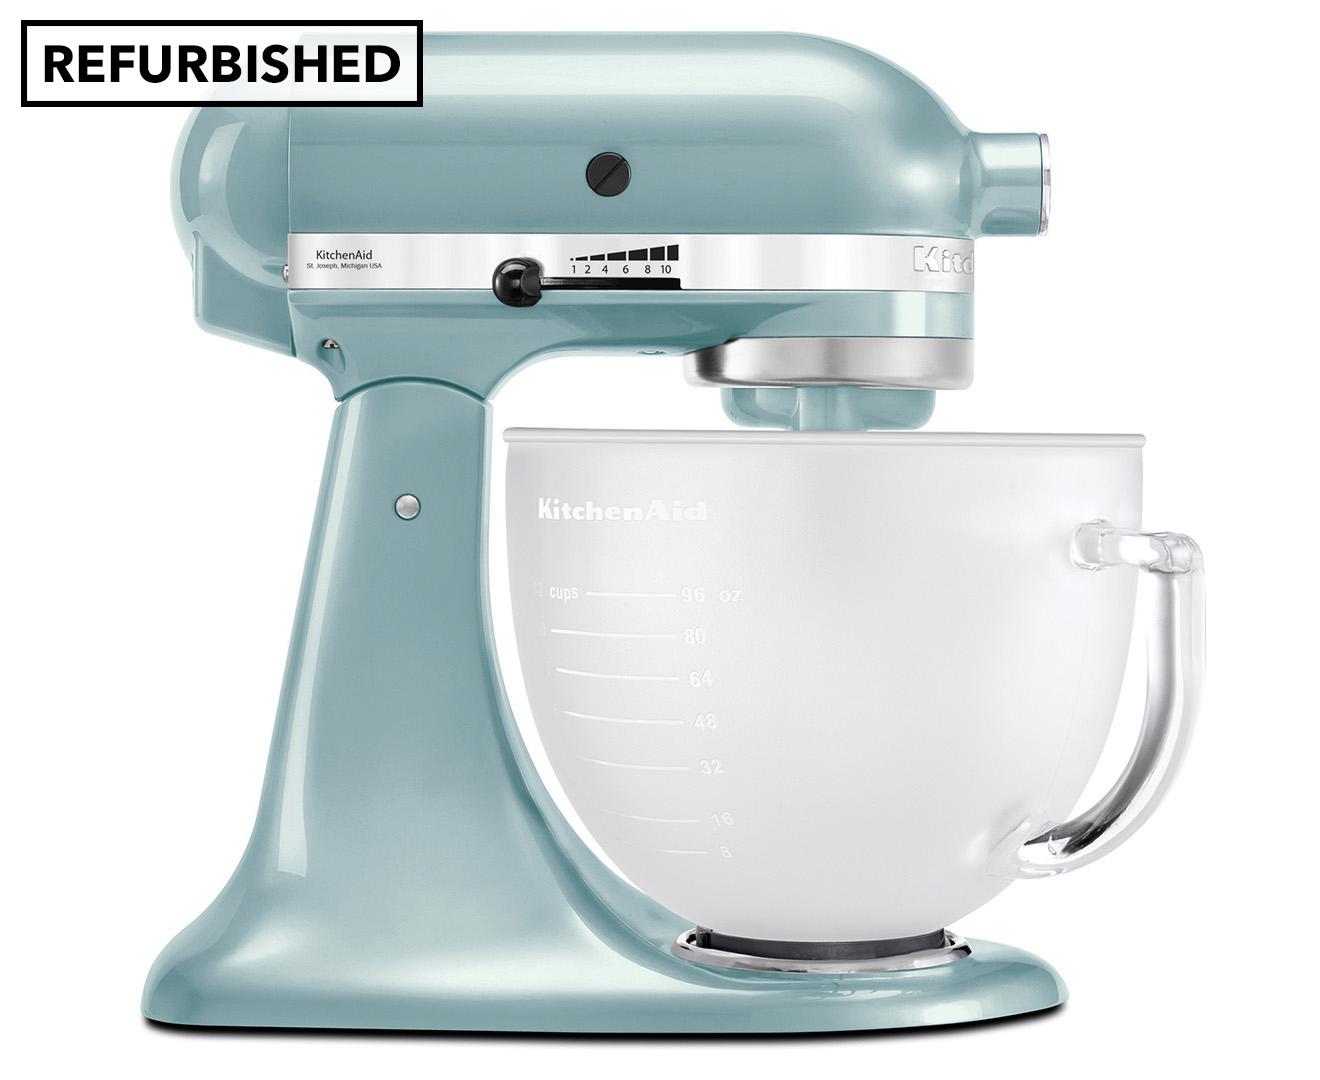 KitchenAid KSM156 Platinum Stand Mixer REFURB - Azure Blue | Catch ...